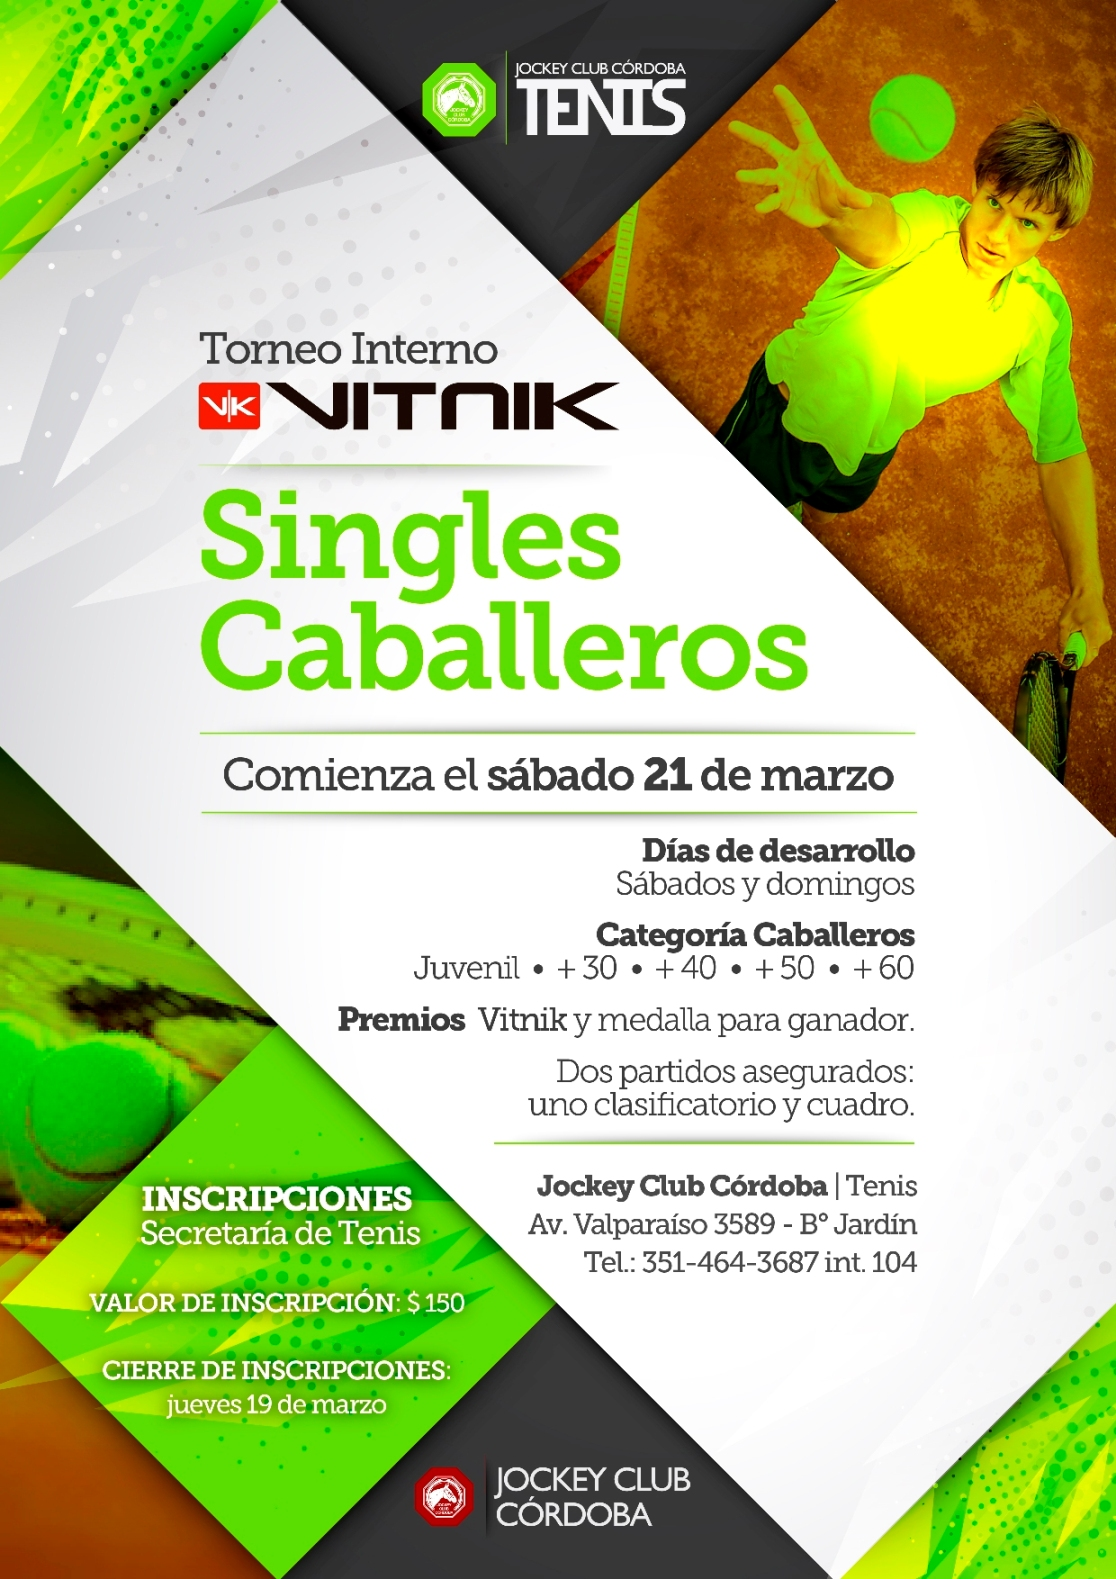 Jockey-Club-Córdoba-Tenis-Torneo-Interno-Singles-Caballeros-Vitnik-02-USOWEB-0202